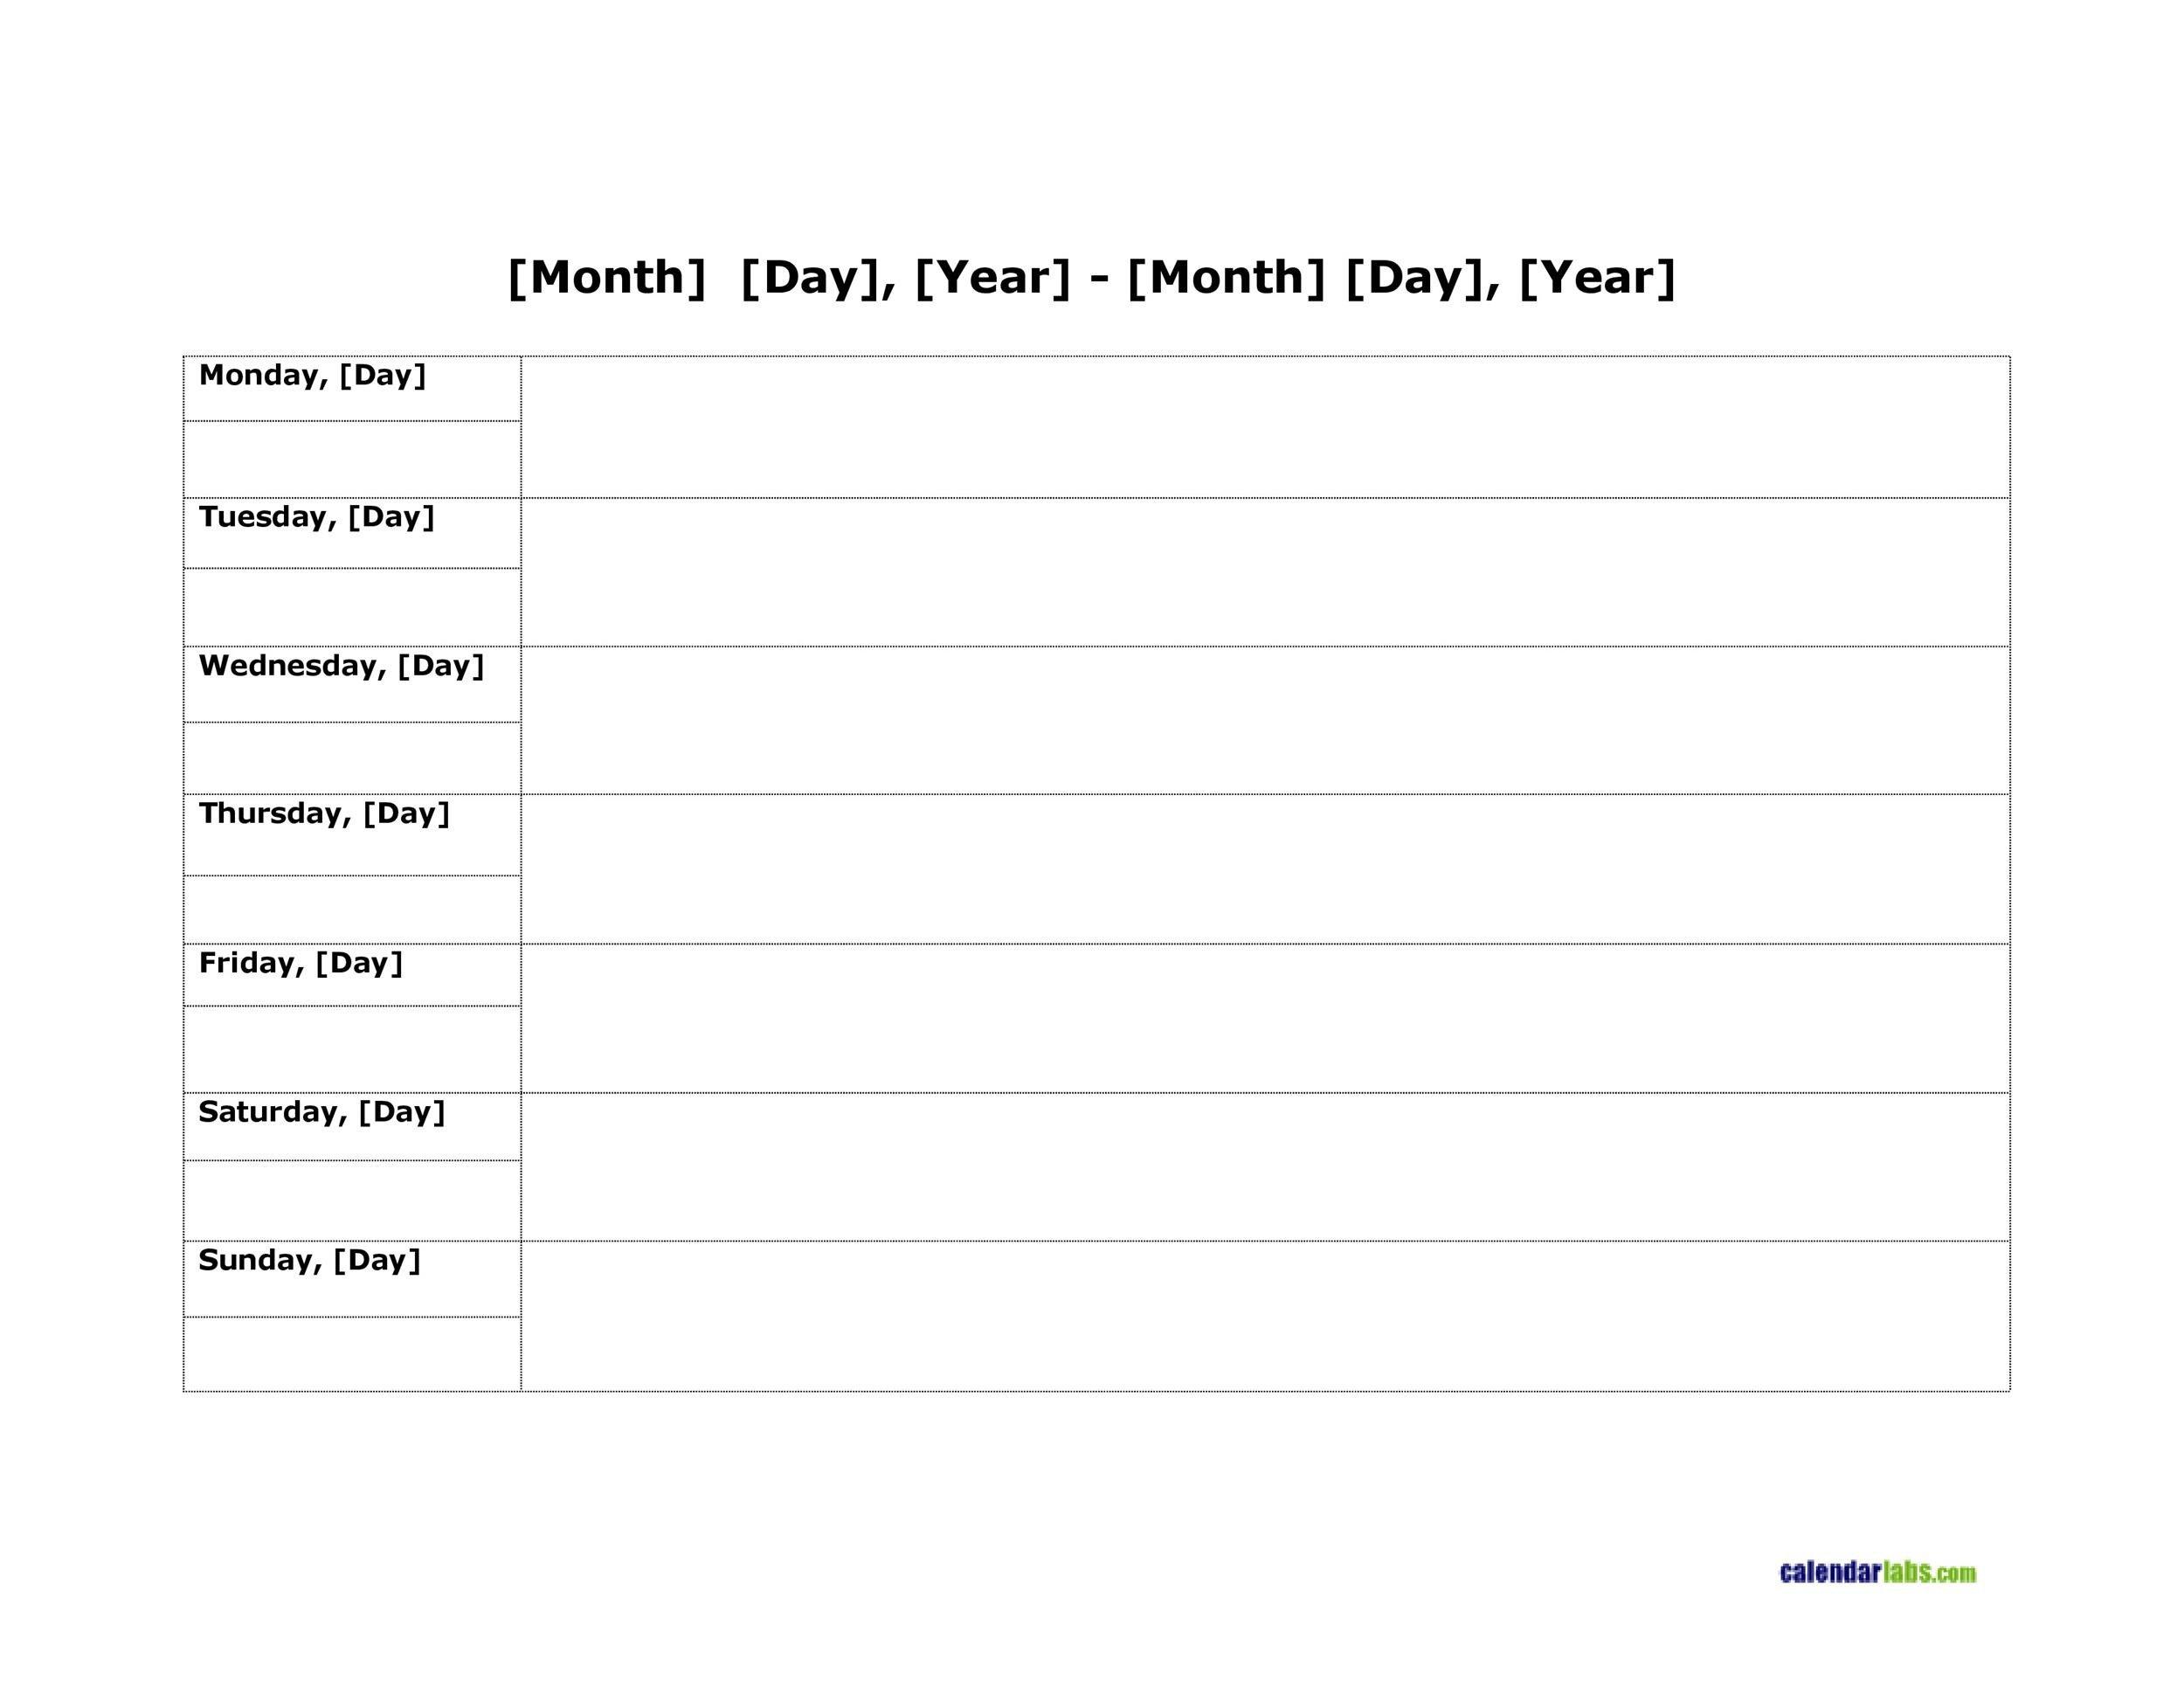 26 Blank Weekly Calendar Templates [Pdf, Excel, Word] ᐅ One Week Monday Through Saturday Communication Calendar